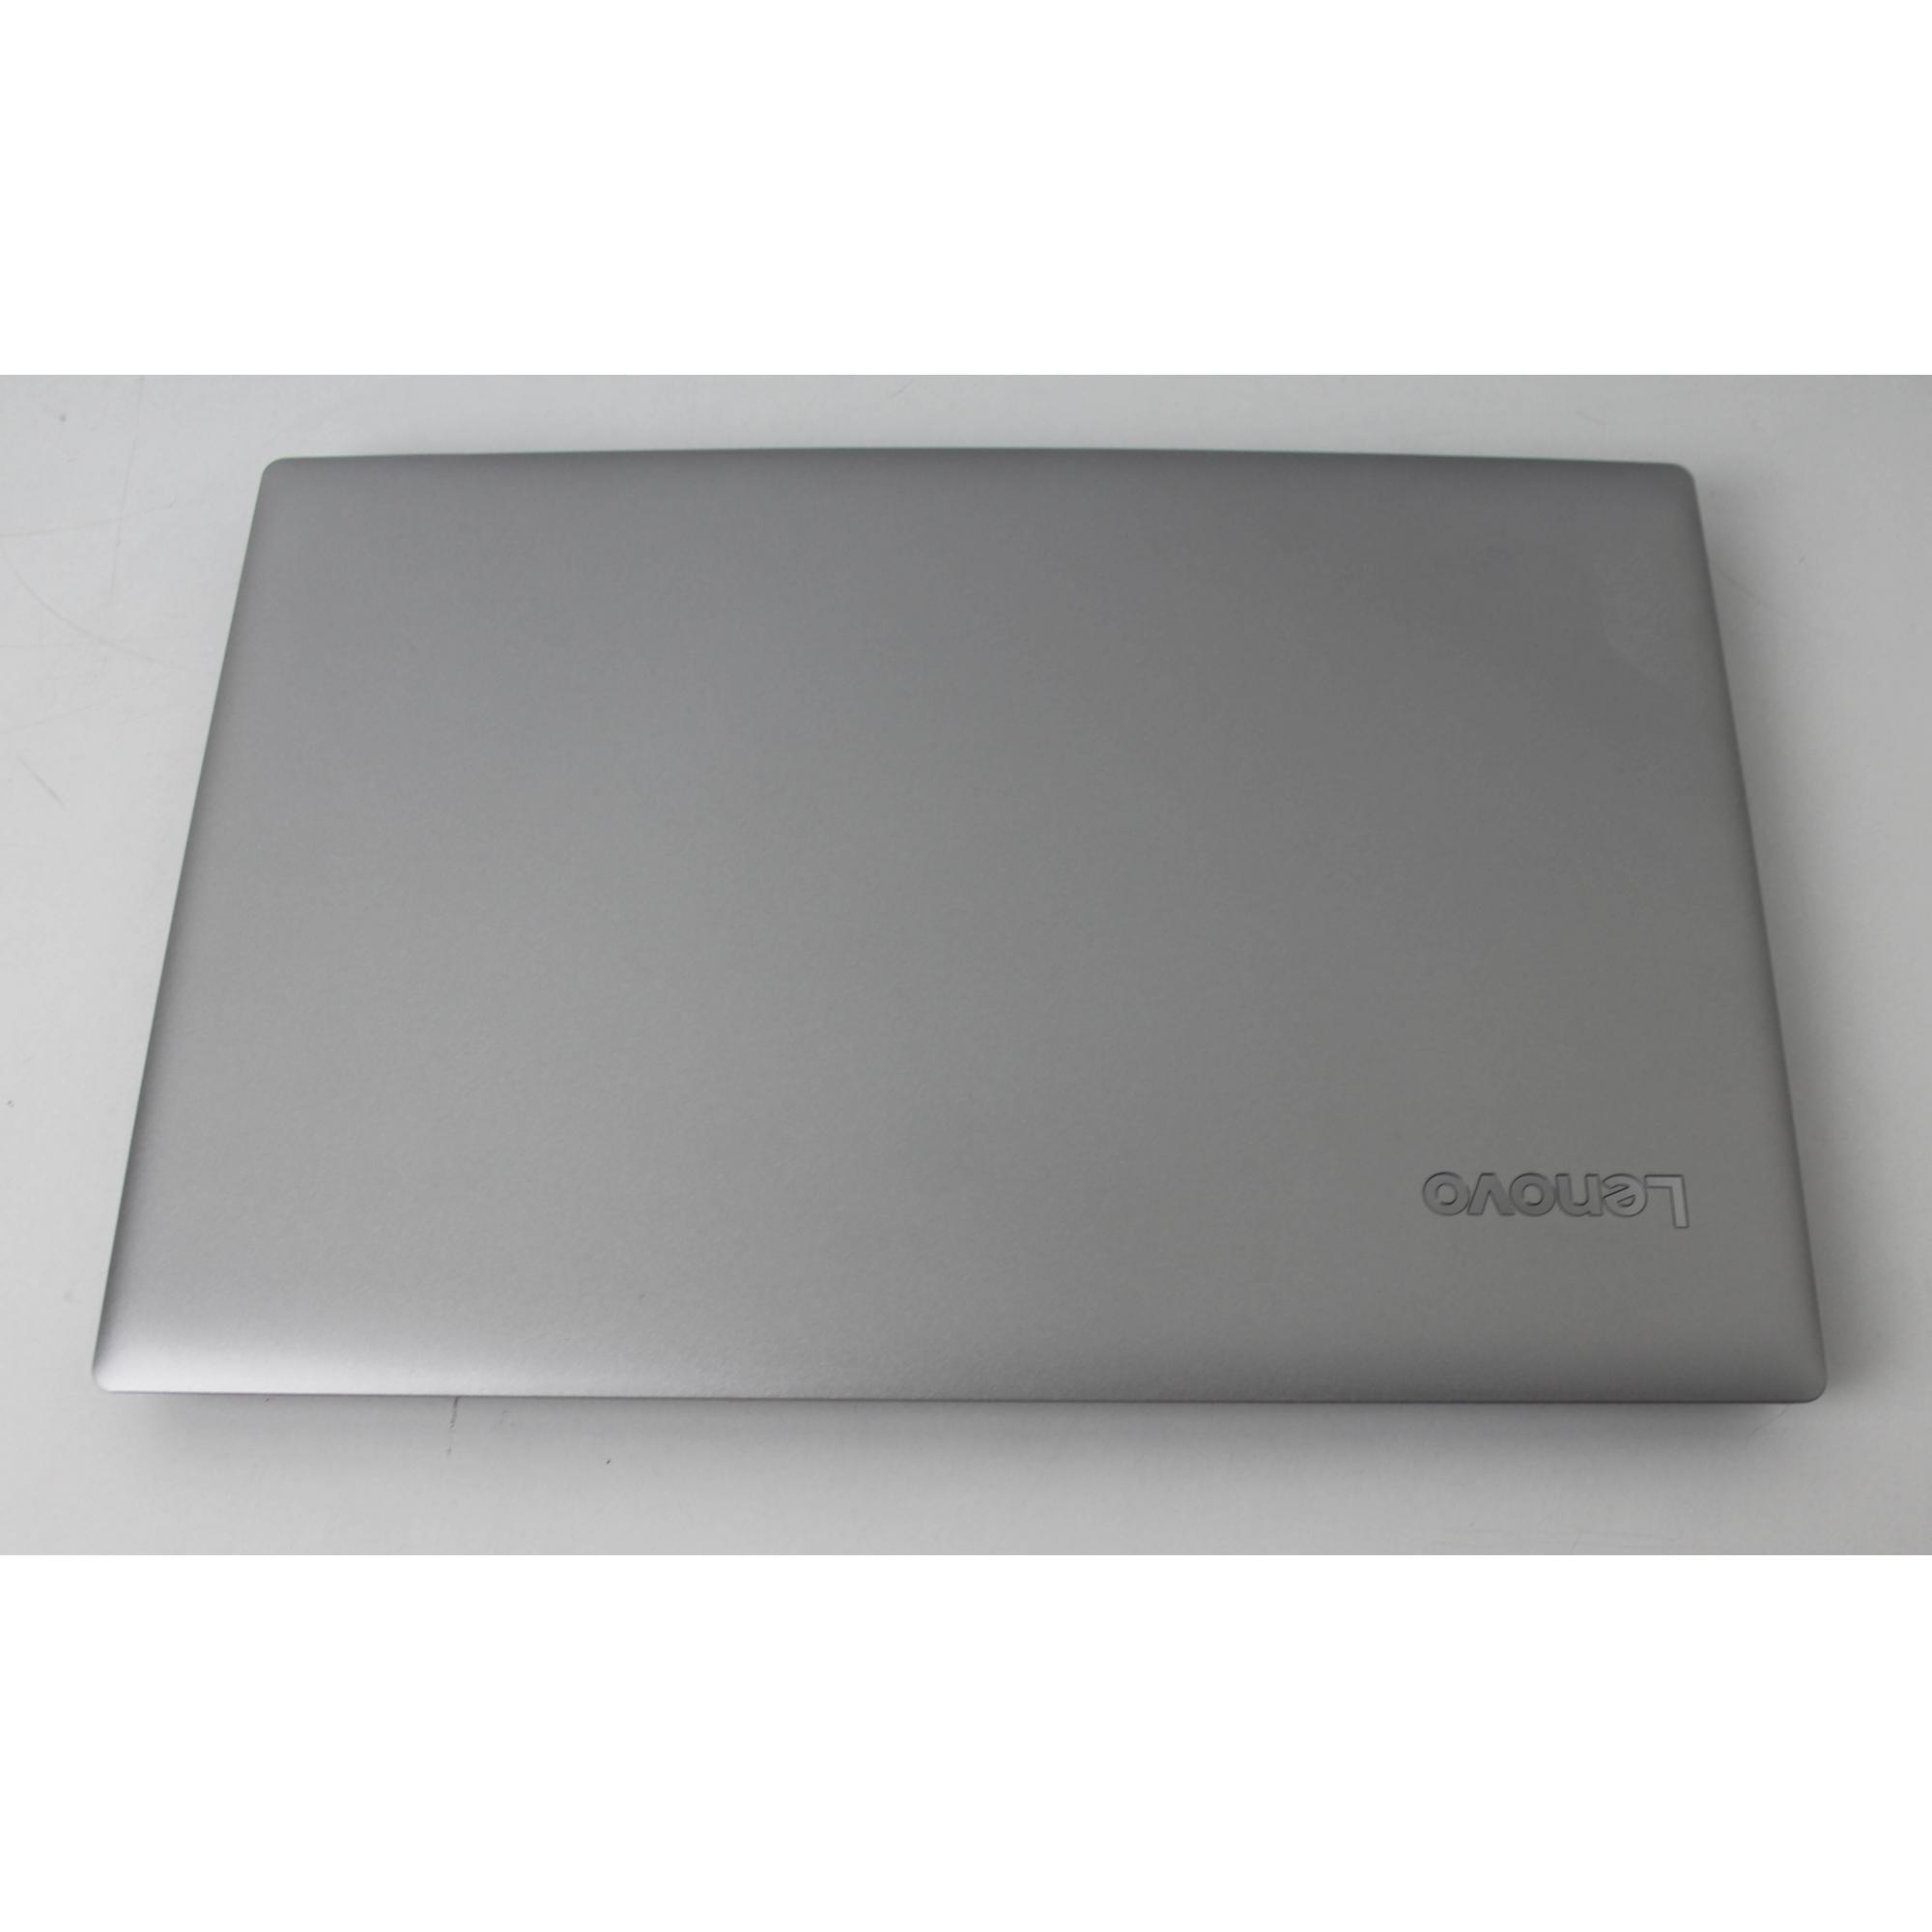 NOTEBOOK LENOVO IDEAPAD 330 15.6'' INTEL CORE I3 2.3GHZ 4GB HD-1TB + ALPHANUMÉRICO